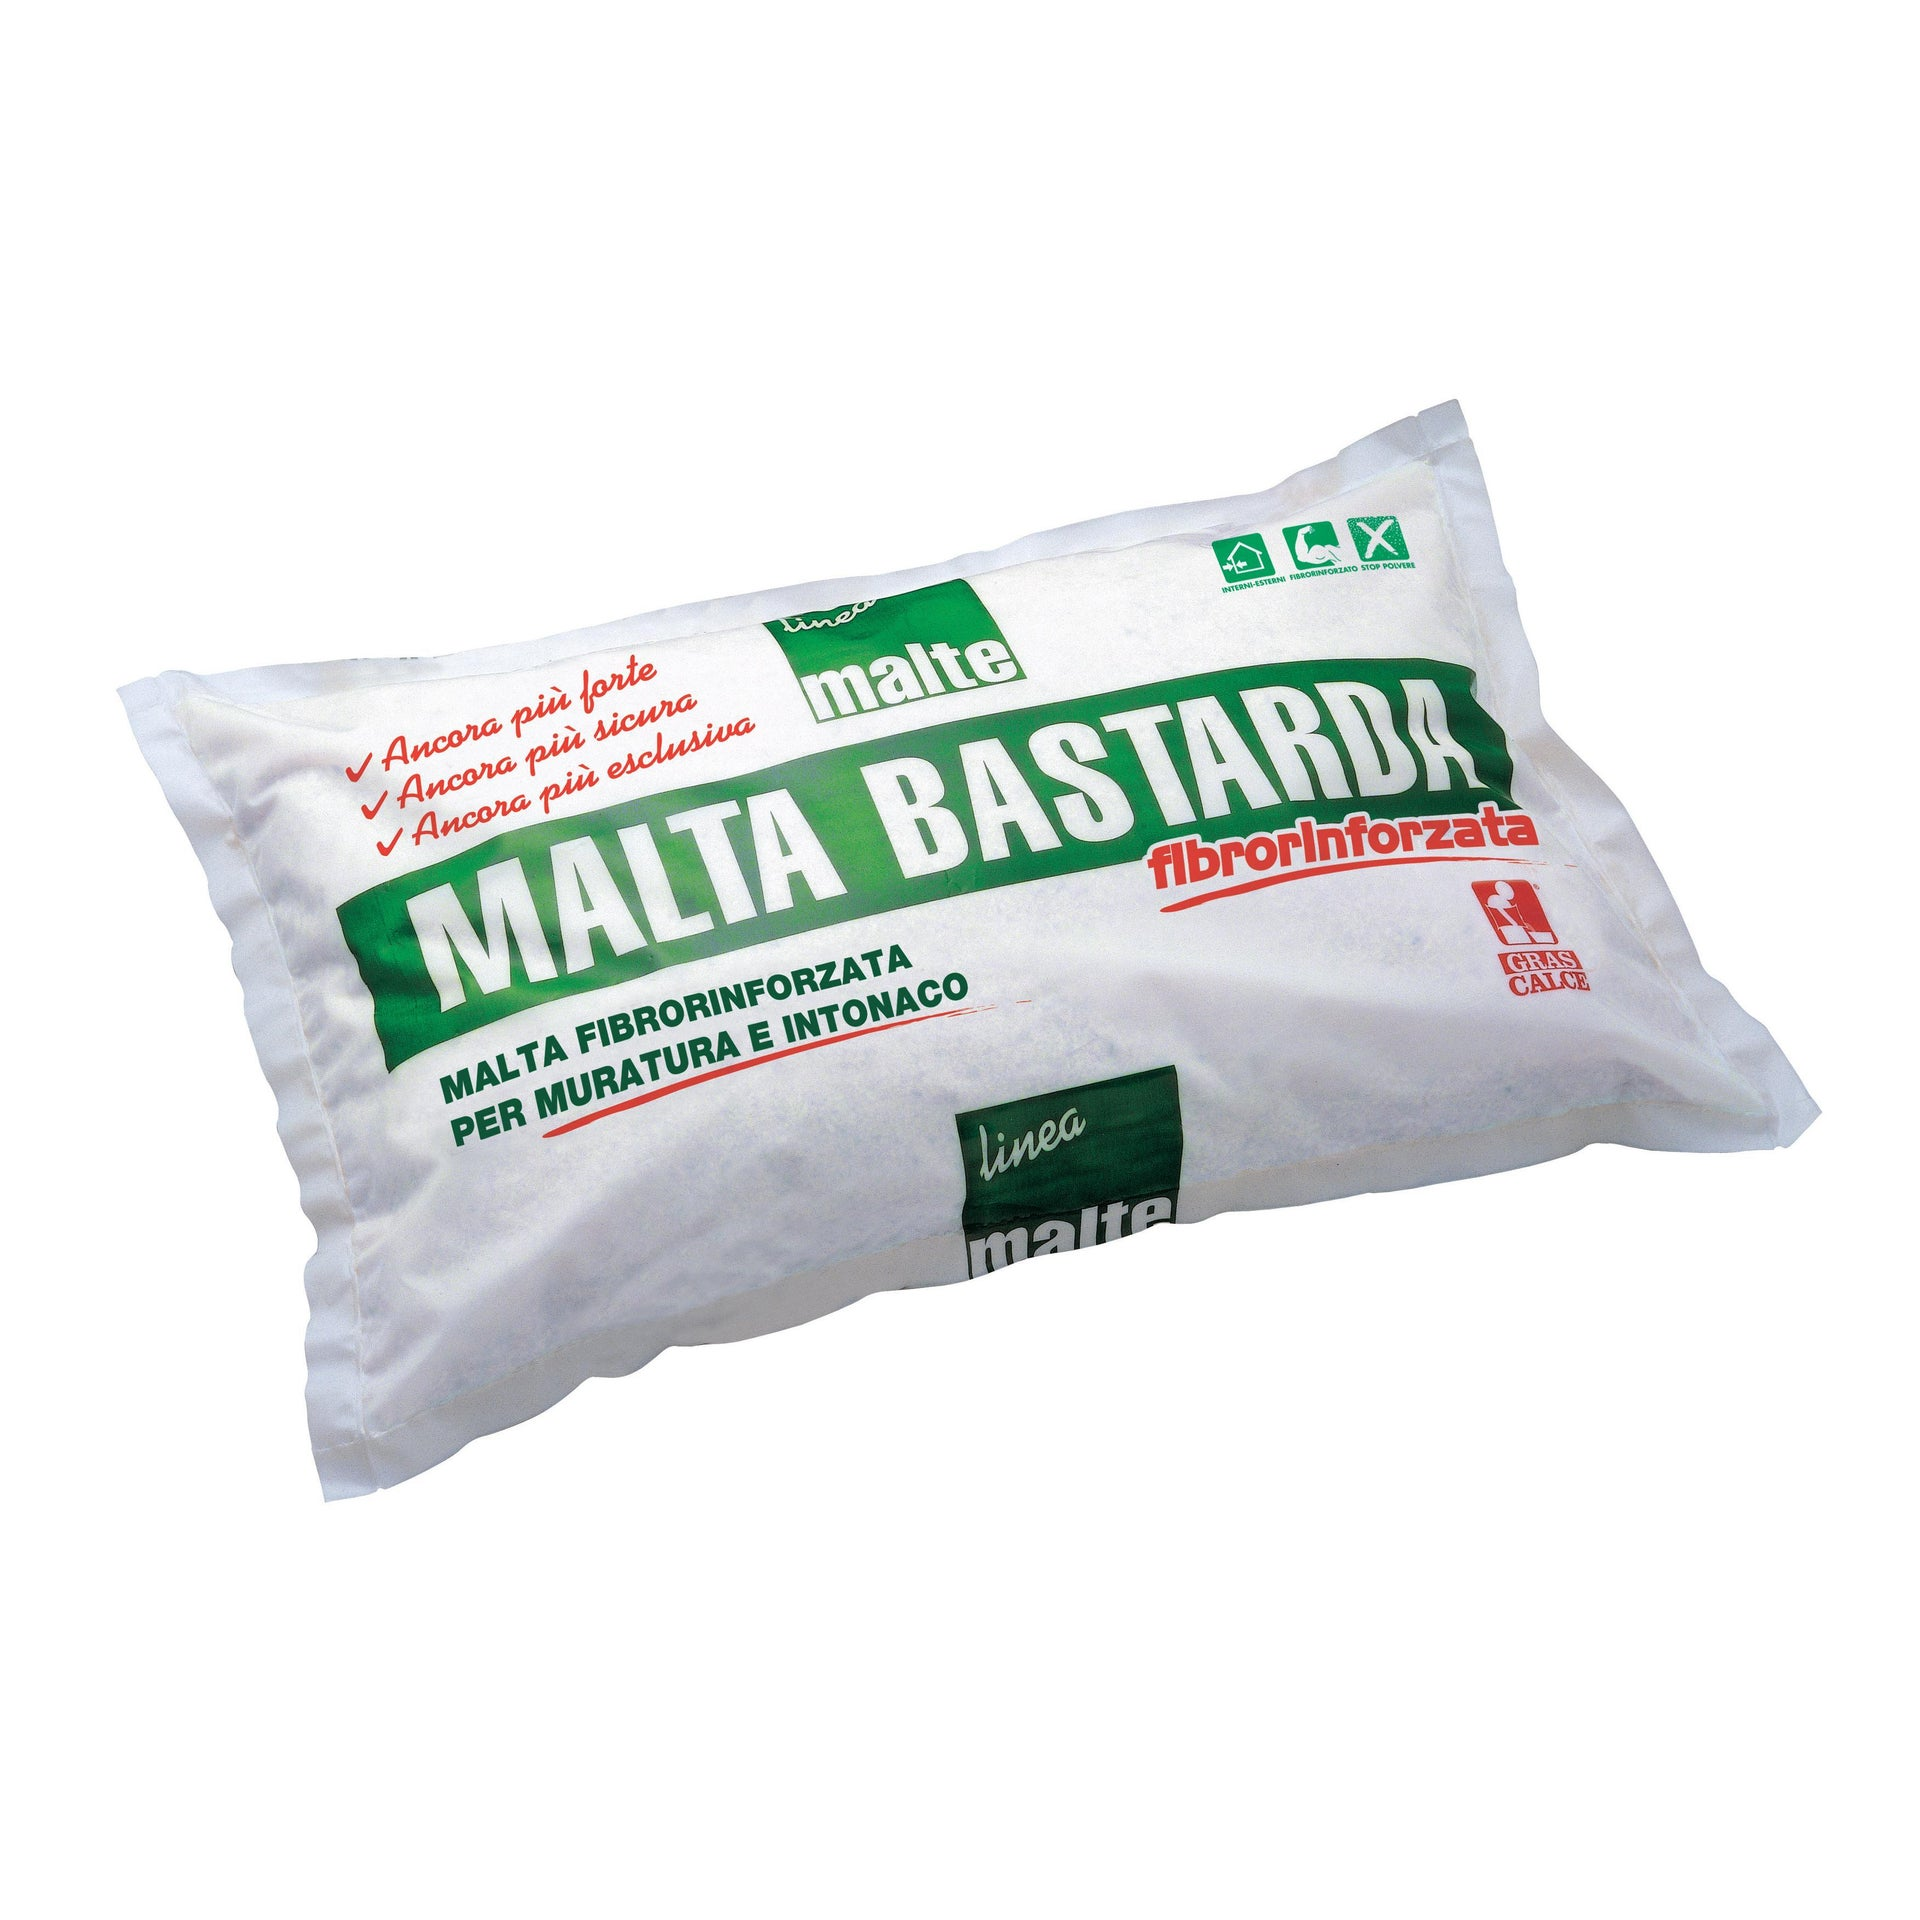 Malta bastarda GRAS CALCE 25 kg - 1